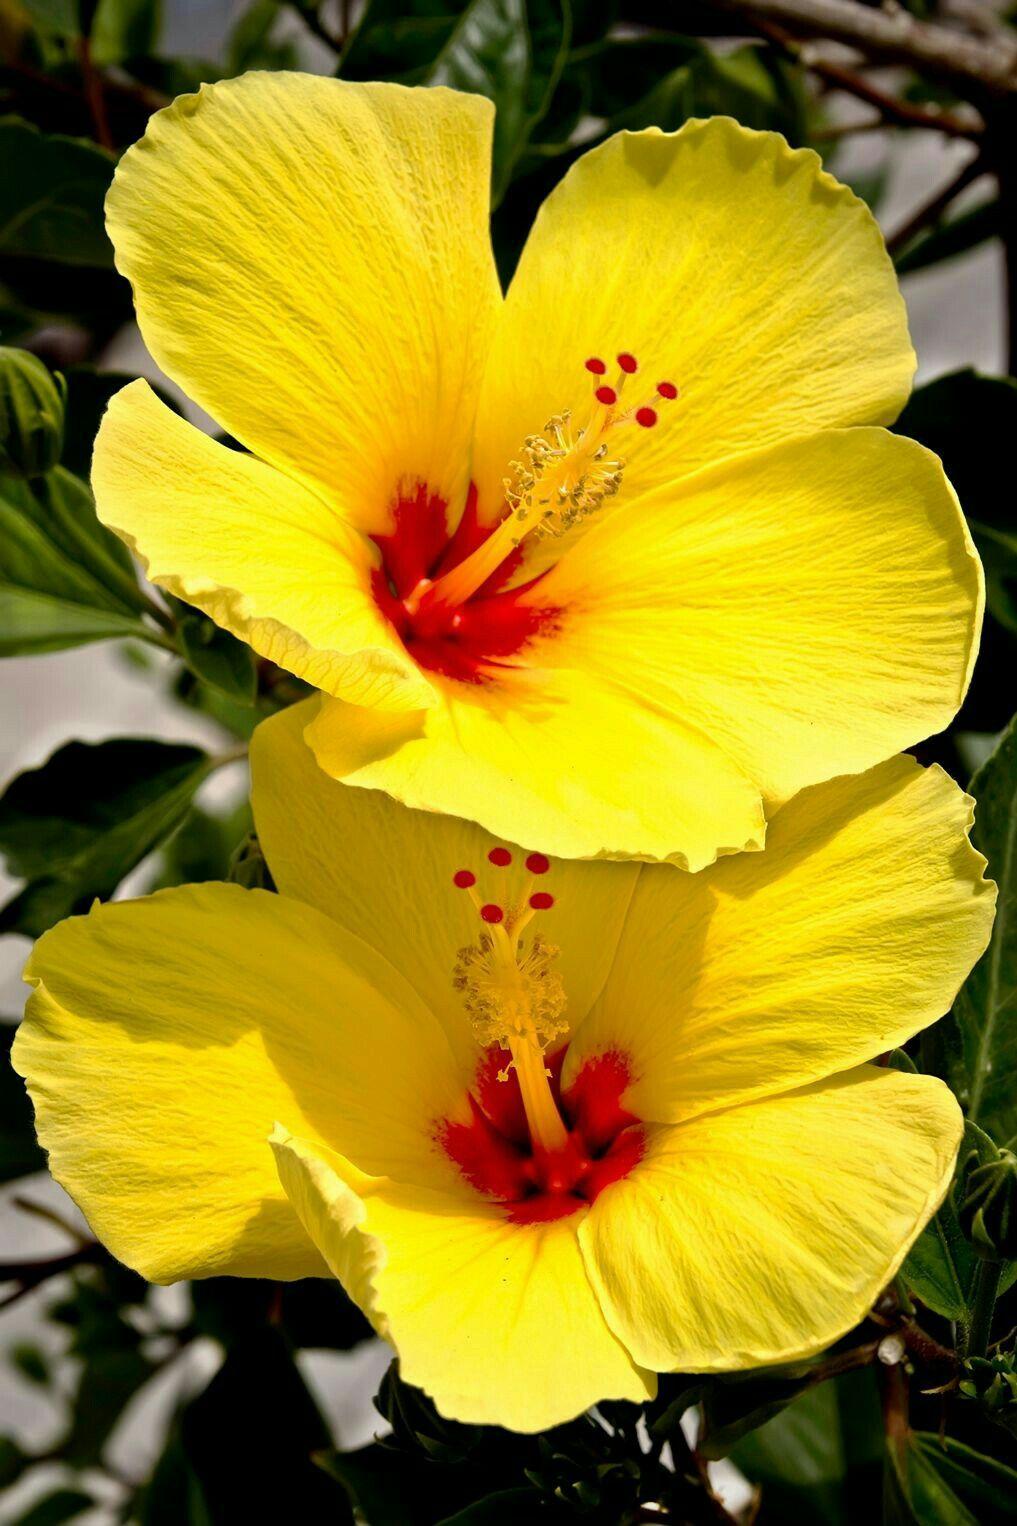 Flowers flowers pinterest flowers yellow hibiscus and hibiscus flowers izmirmasajfo